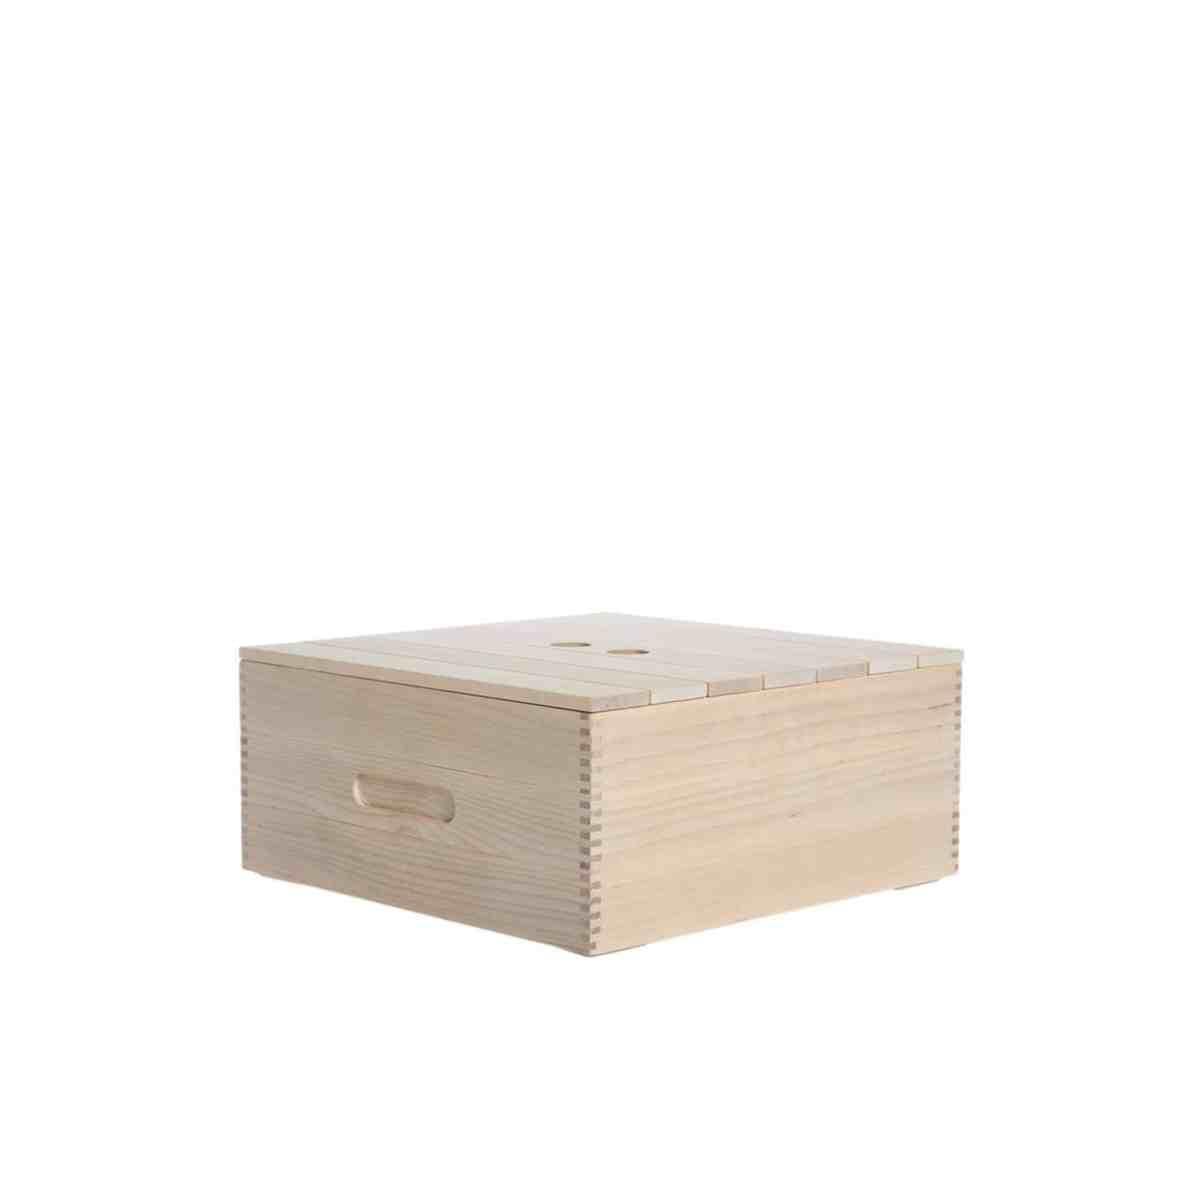 bread-box-lid-large-1